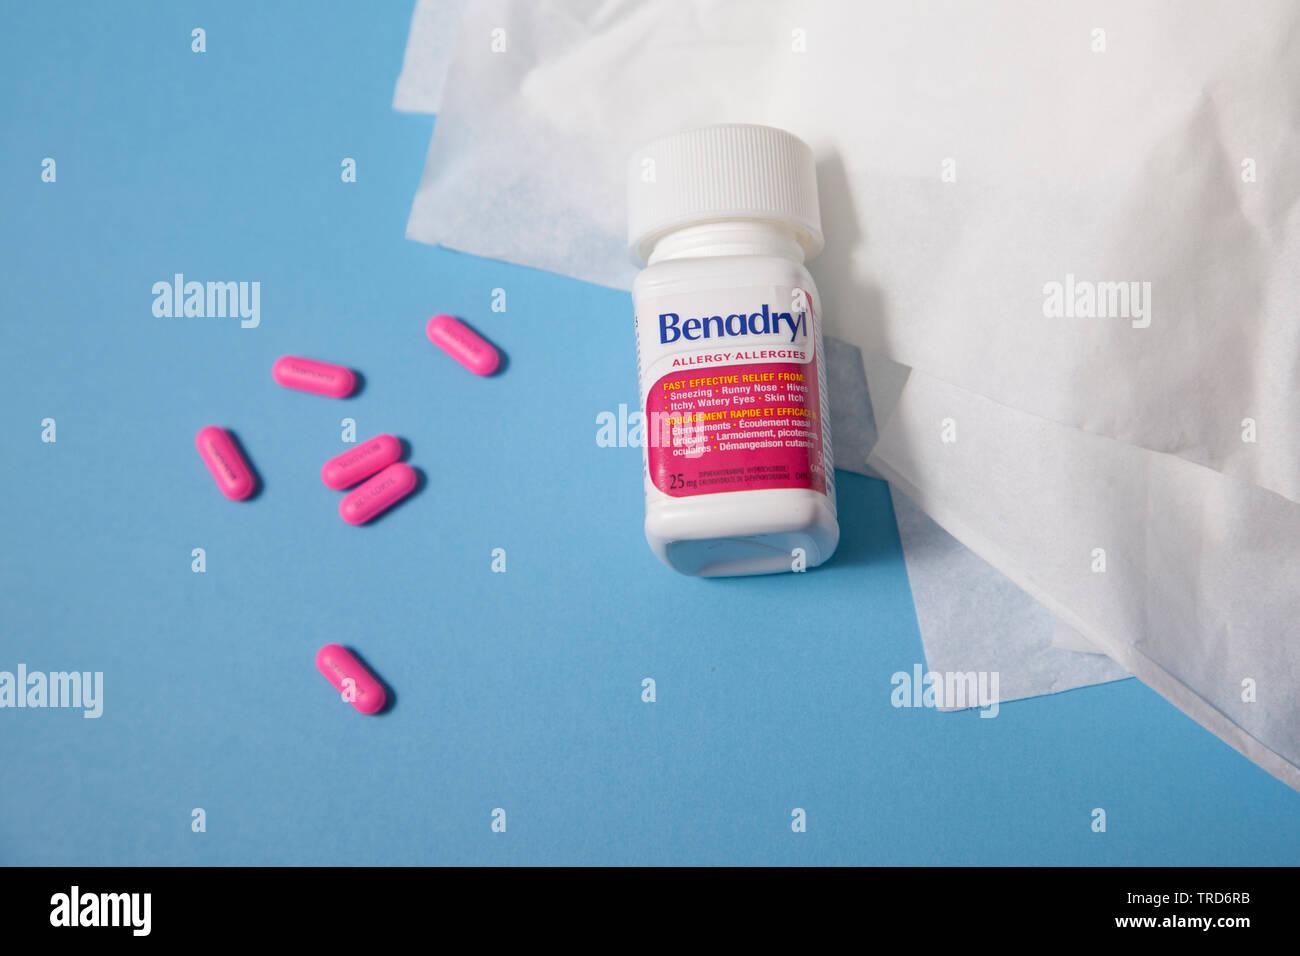 mestinon 60 mg price in uae